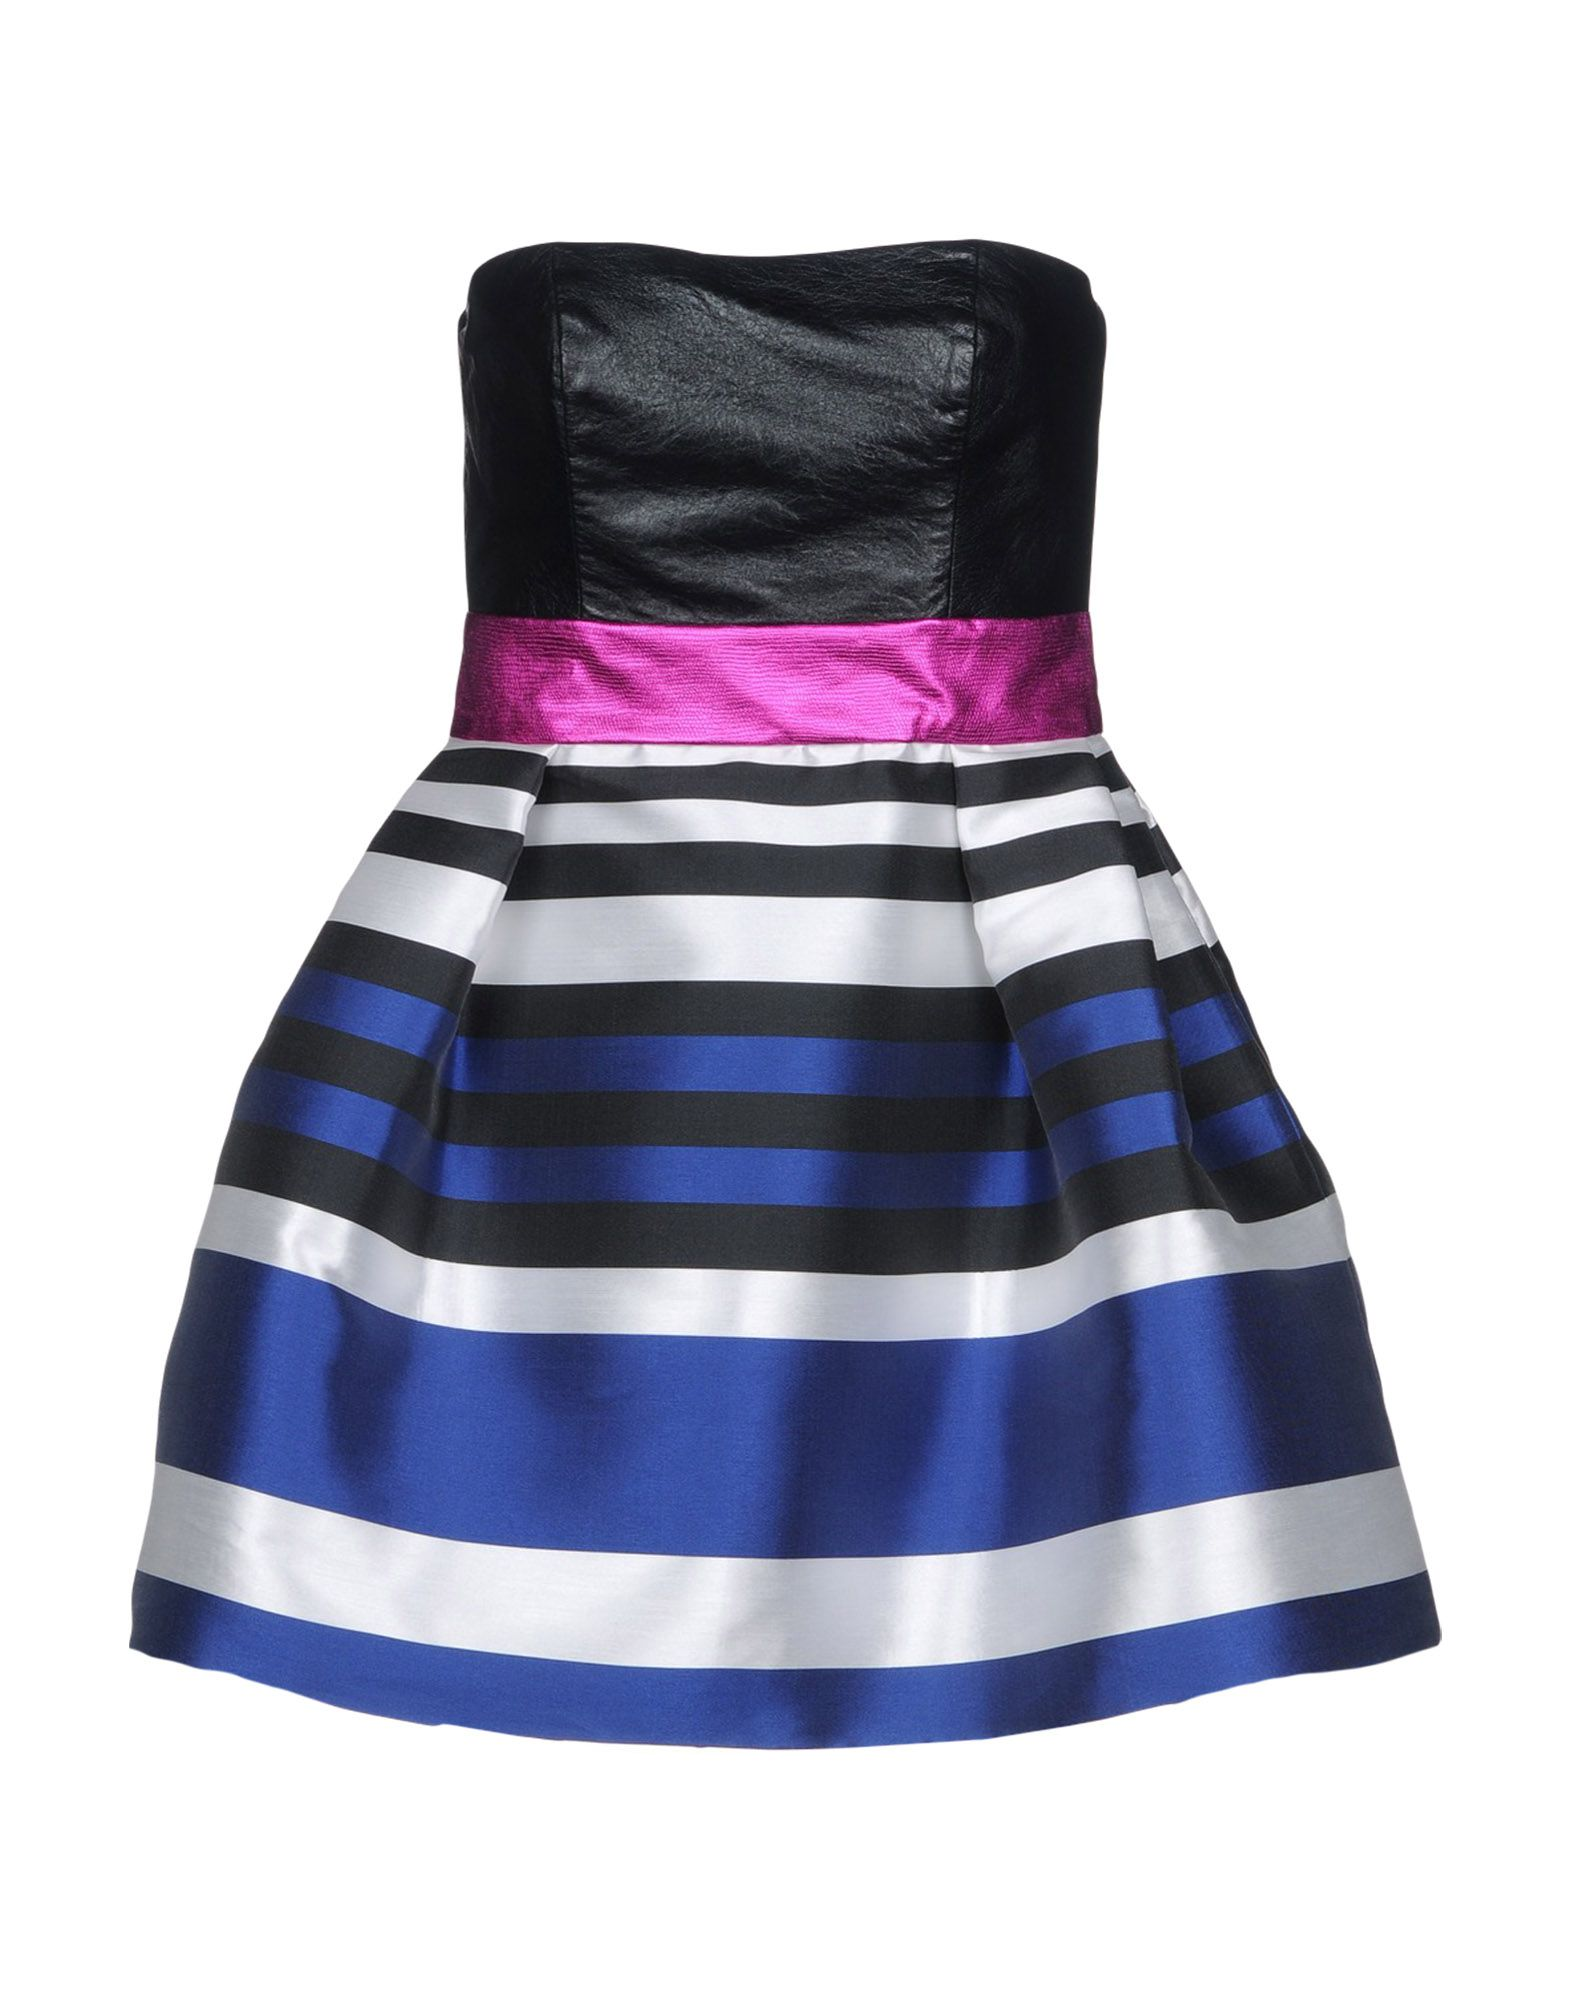 N°8 Короткое платье free shipping 500pcs ao4468 4468 sop 8 new original mosfet n channel 8 soic